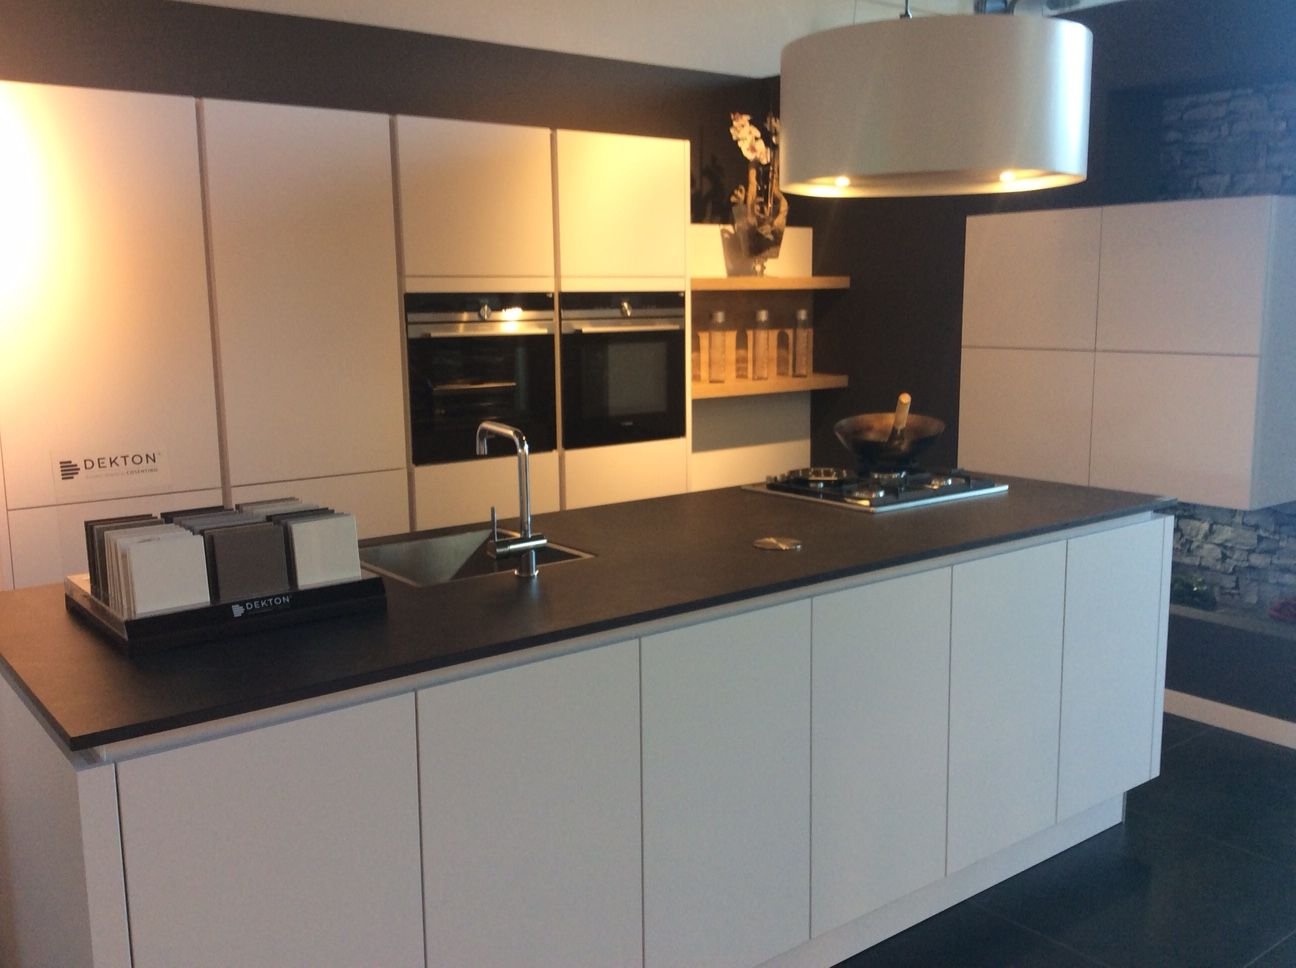 Keuken Kookeiland Zwart : Modern en tijdloos witte greeploze keuken kookeiland met zwart